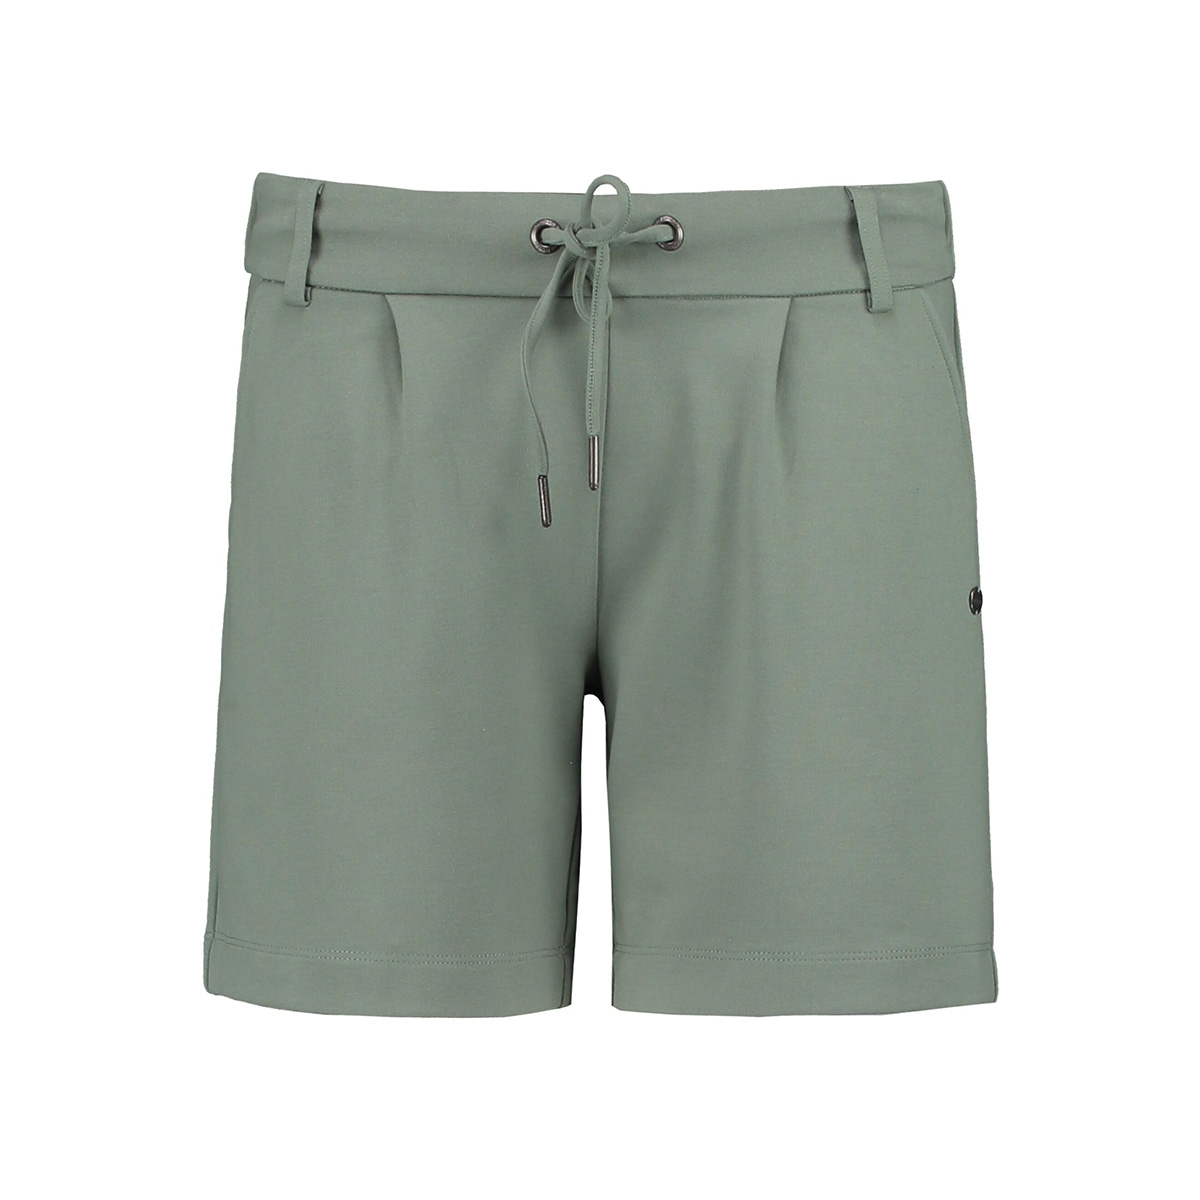 short p00342 garcia korte broek 2277 soft army